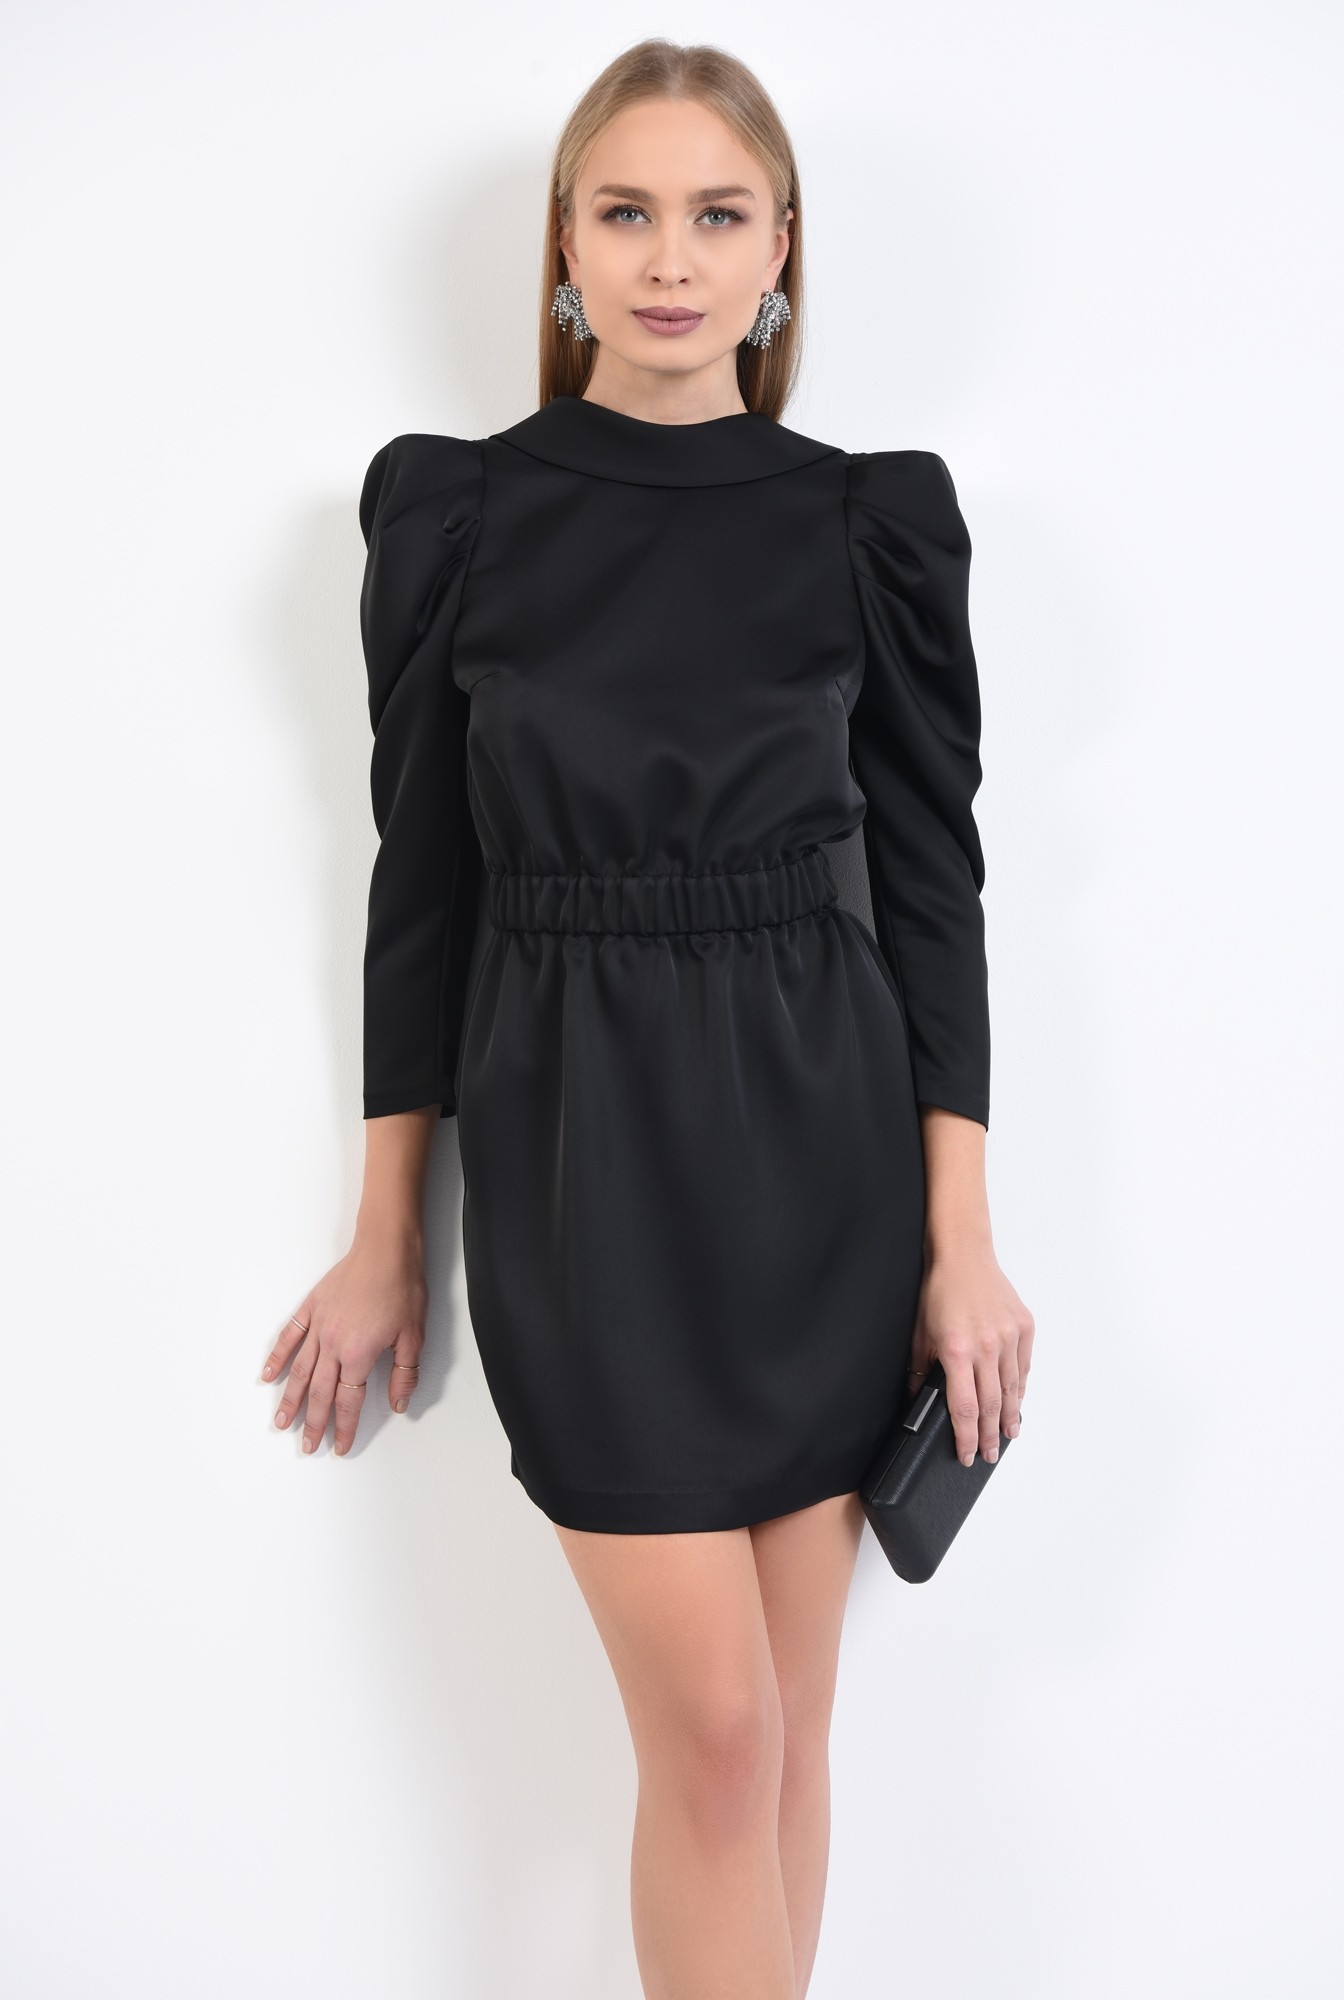 0 - 360 - rochie de ocazie, neagra, mini, maneci fantezie, tesatura satinata